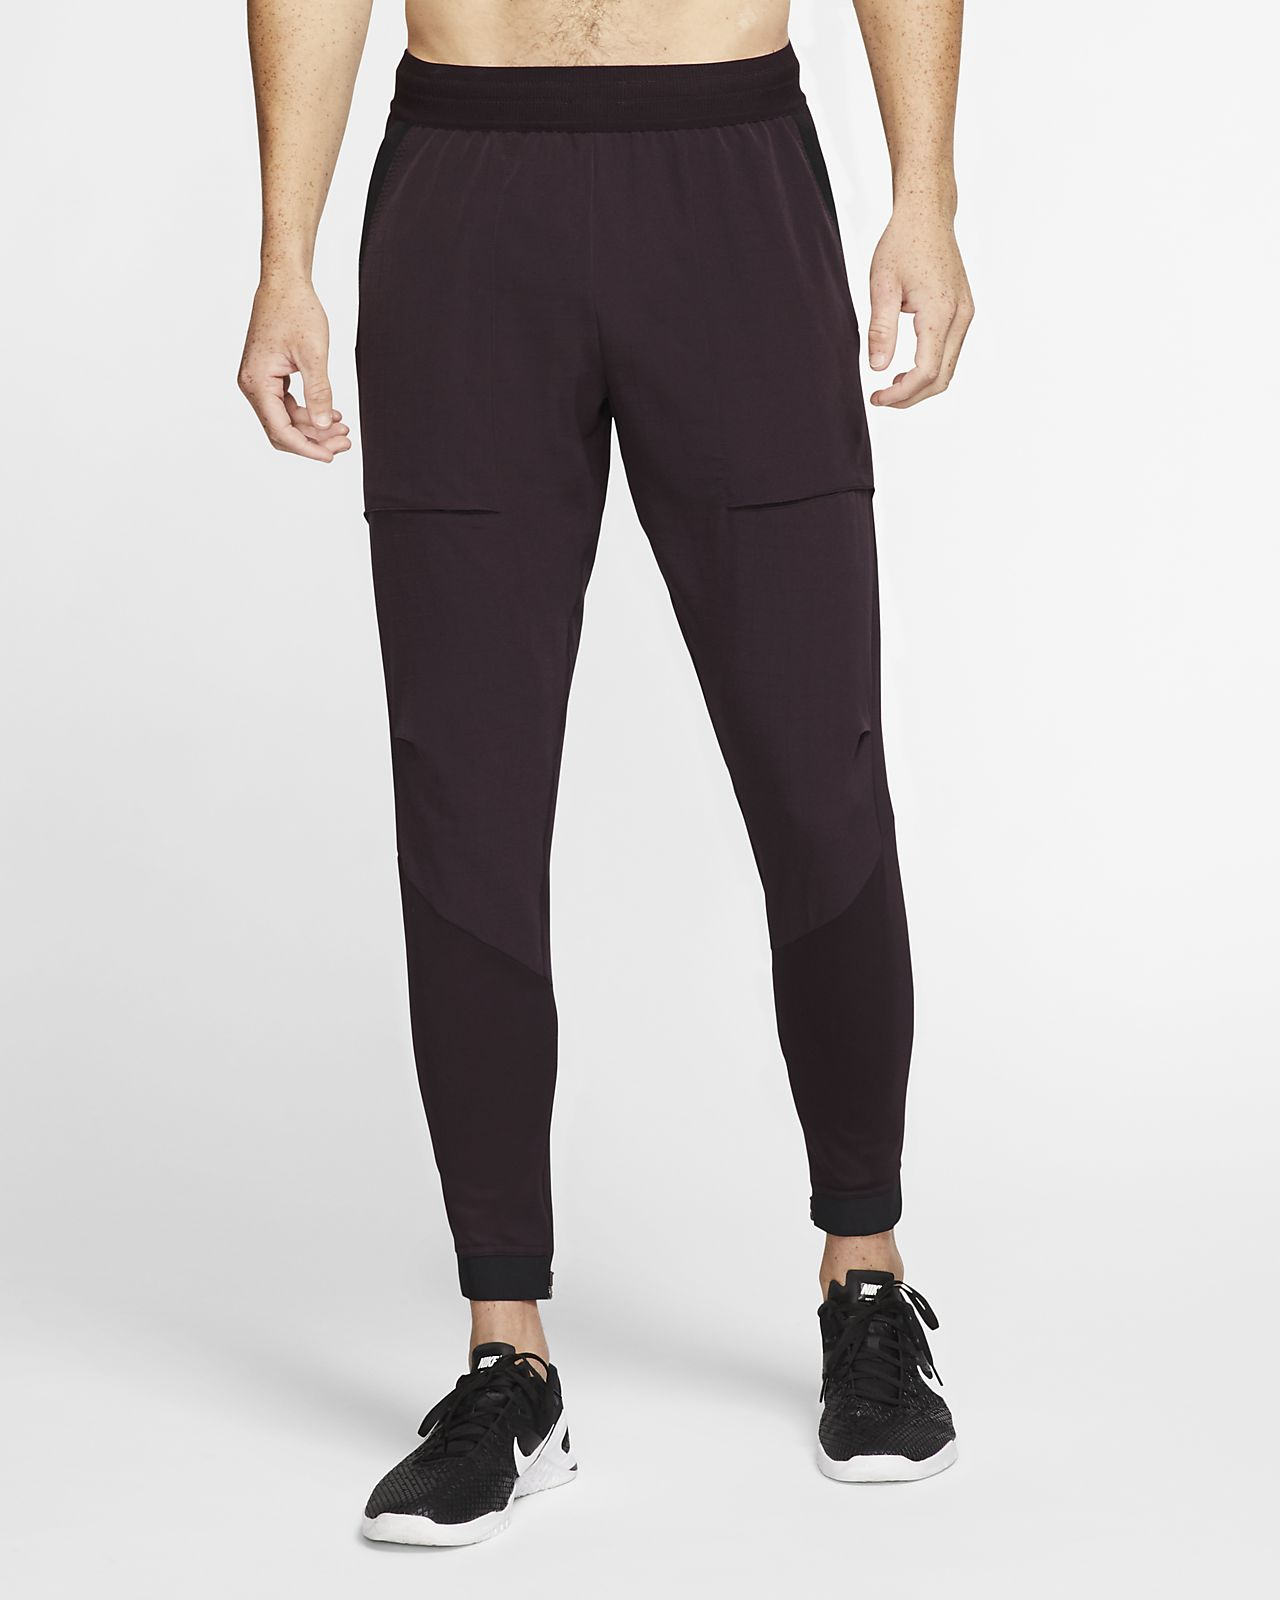 Nike Flex Pantalón de entrenamiento - Hombre